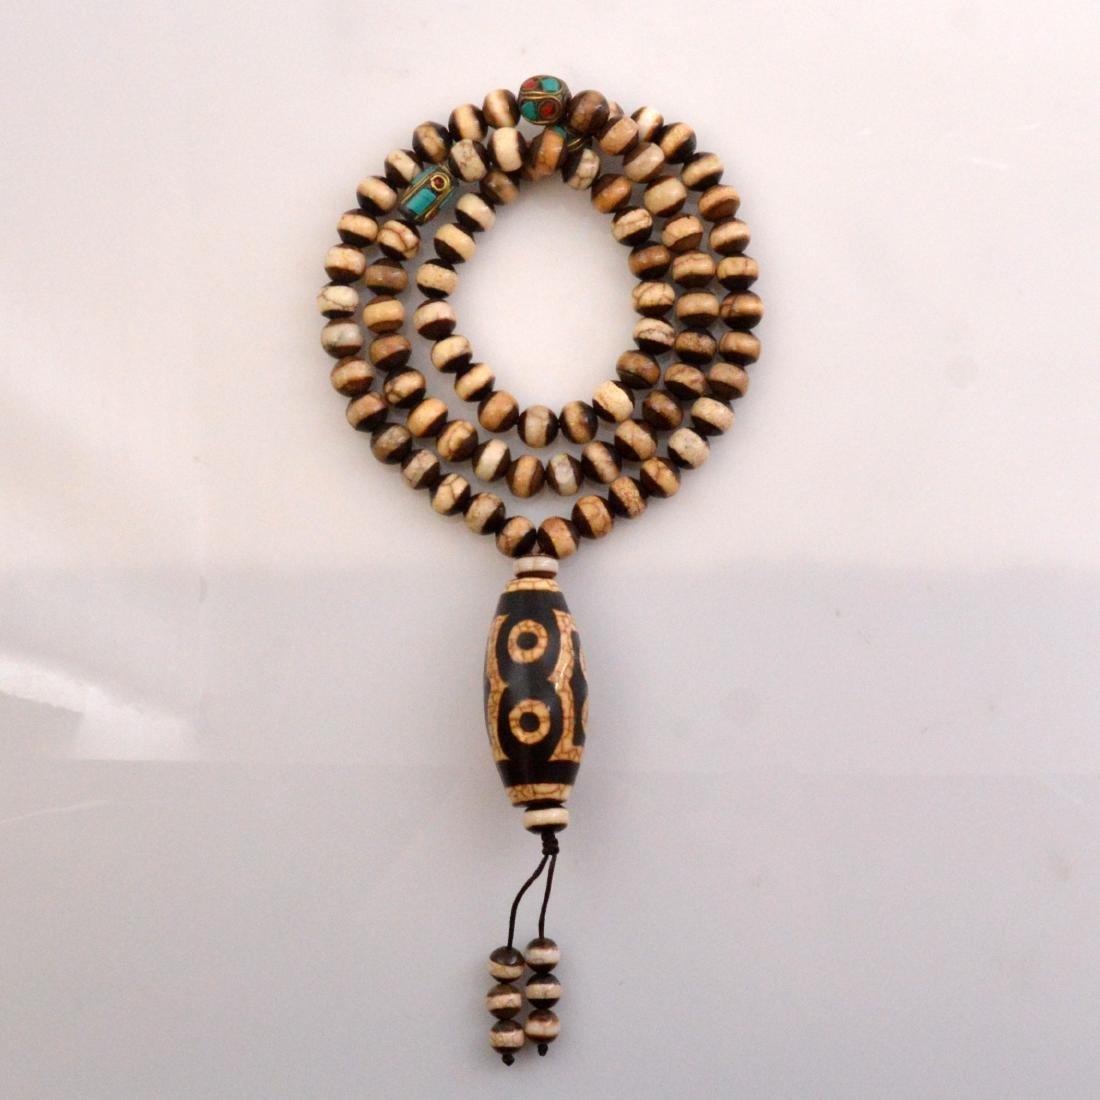 Seven-Eyed Dzi Bead Necklace